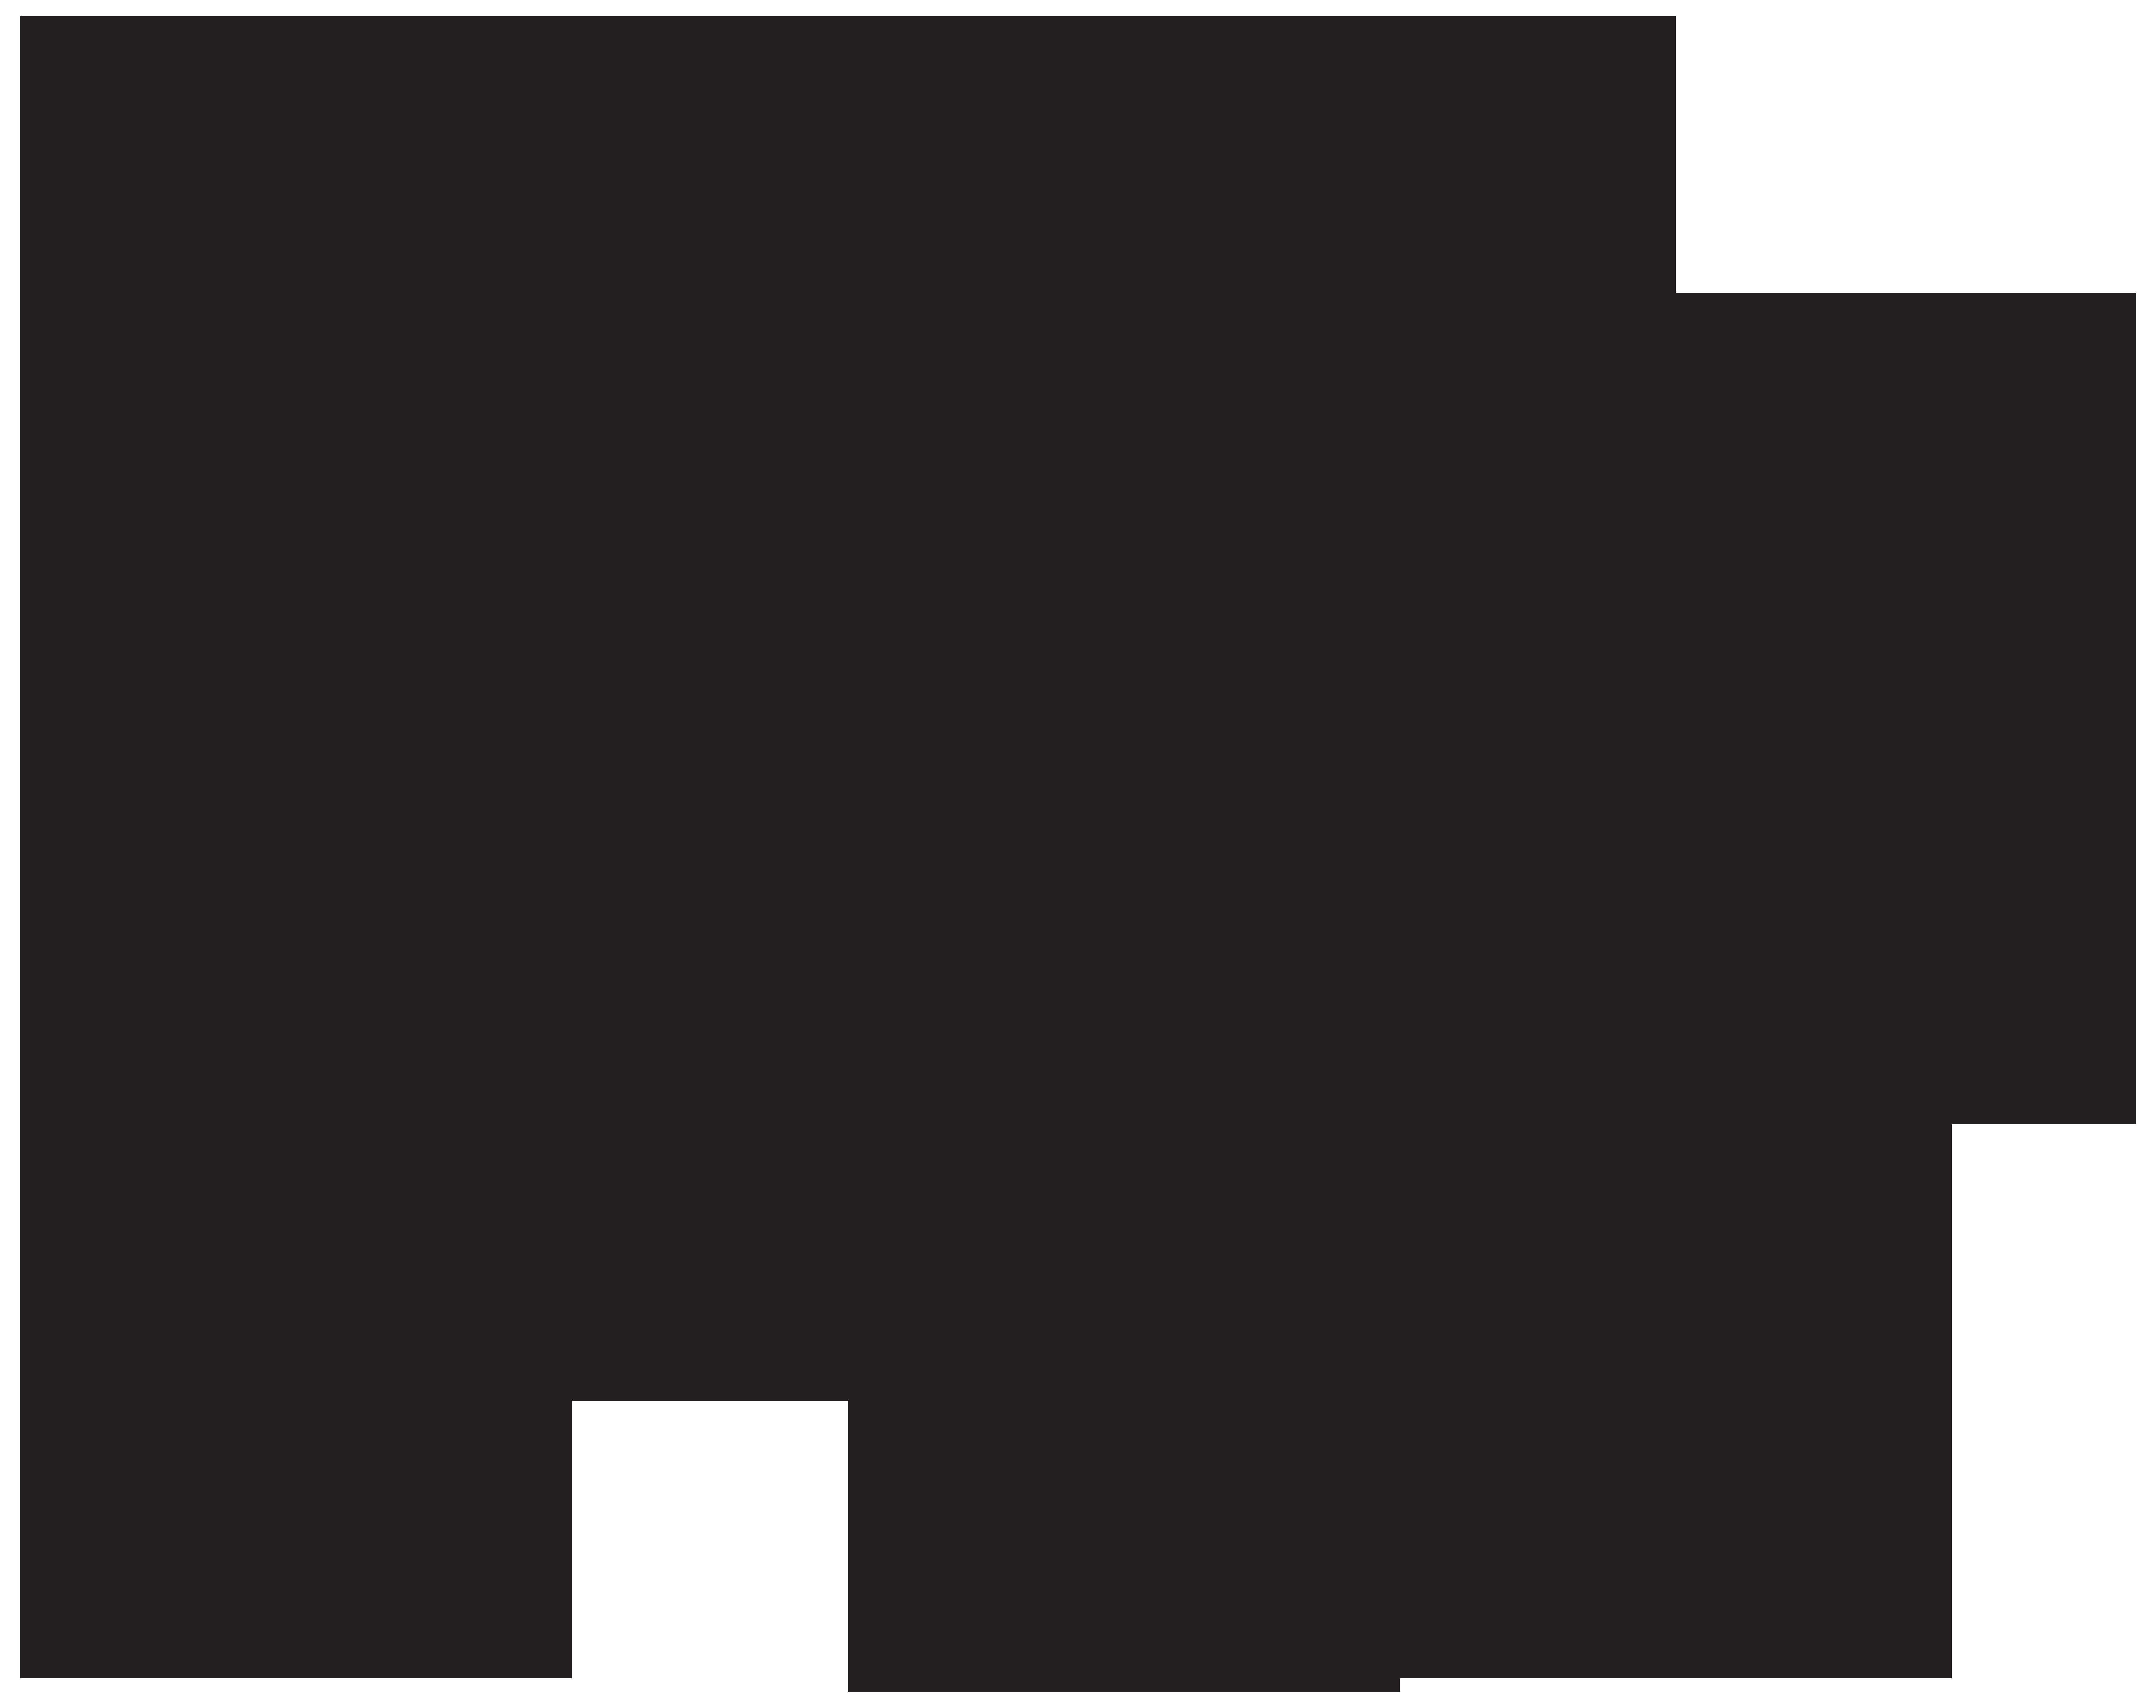 Silhouette png clip art. Clipart bear polar bear